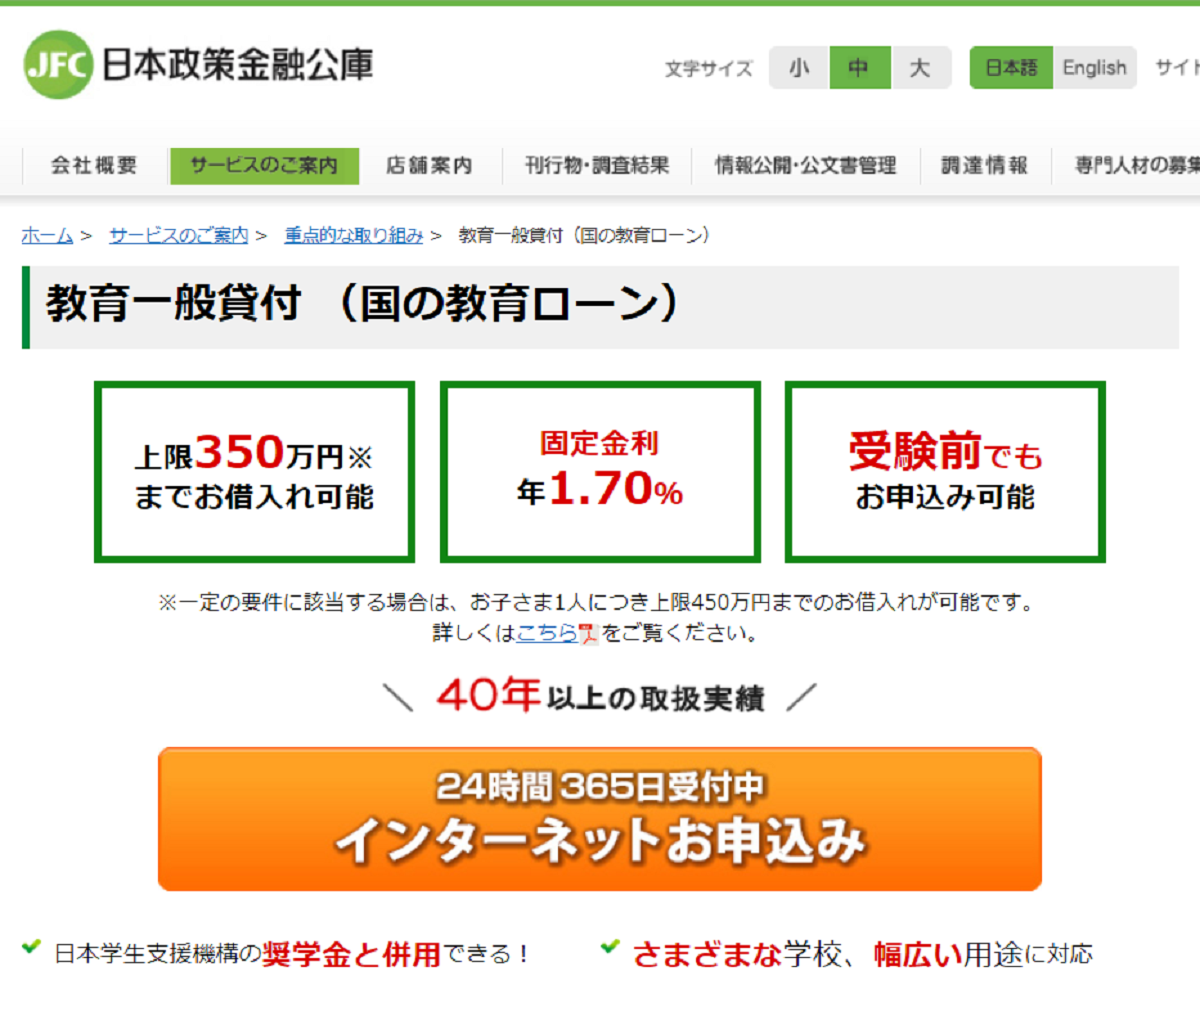 f:id:kyouikuloans:20200520104659p:image